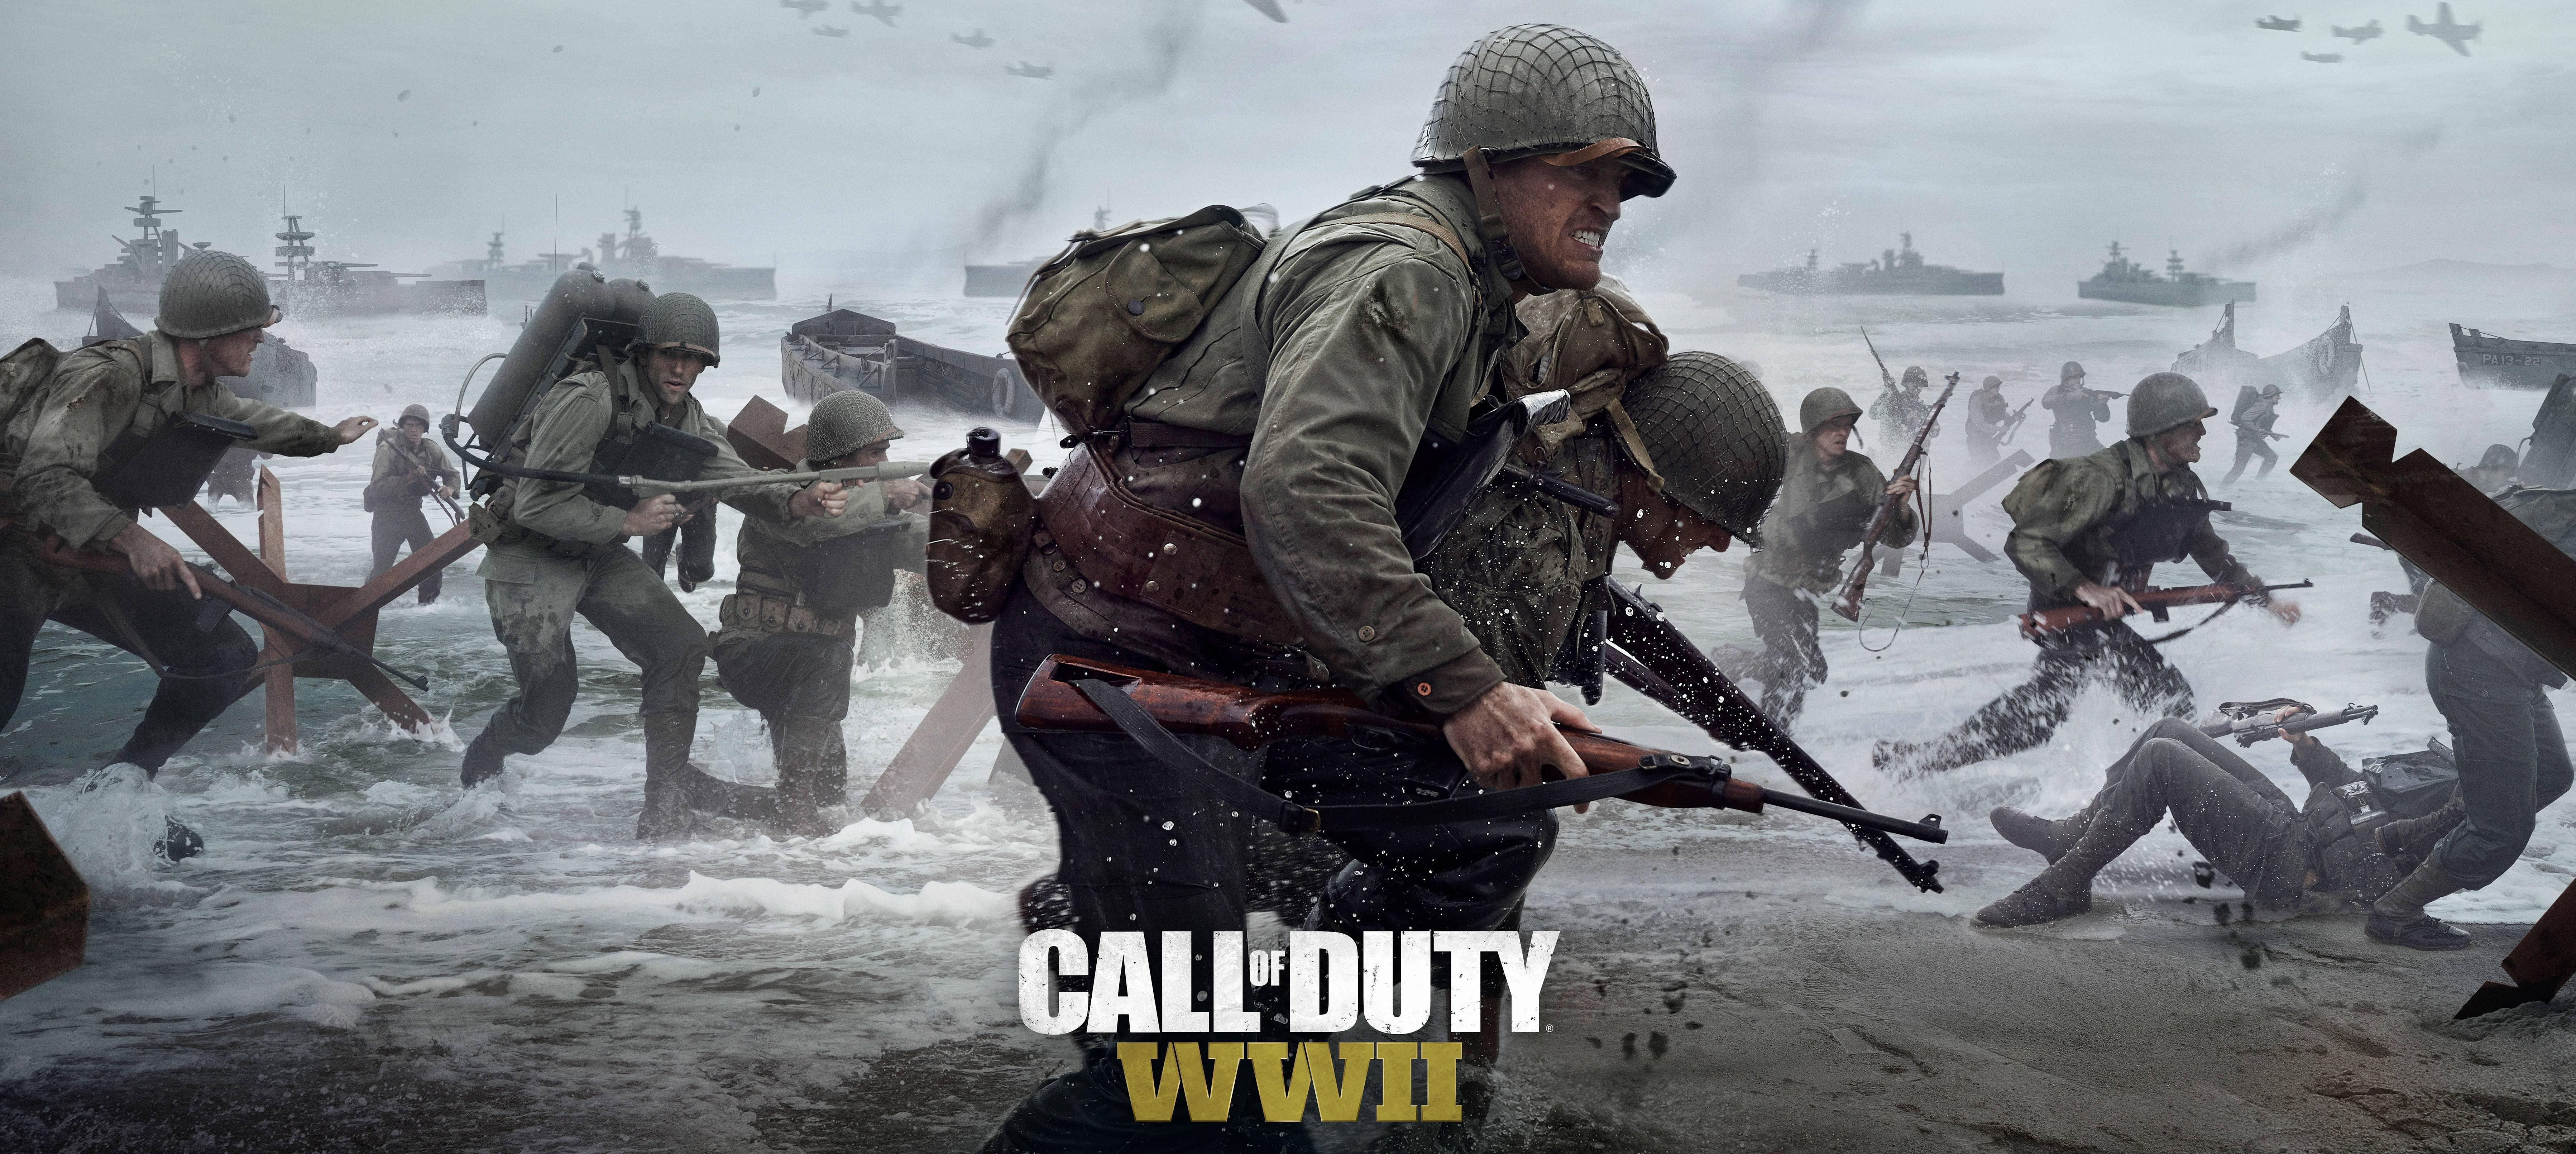 Fondos de pantalla Call of duty World war 2